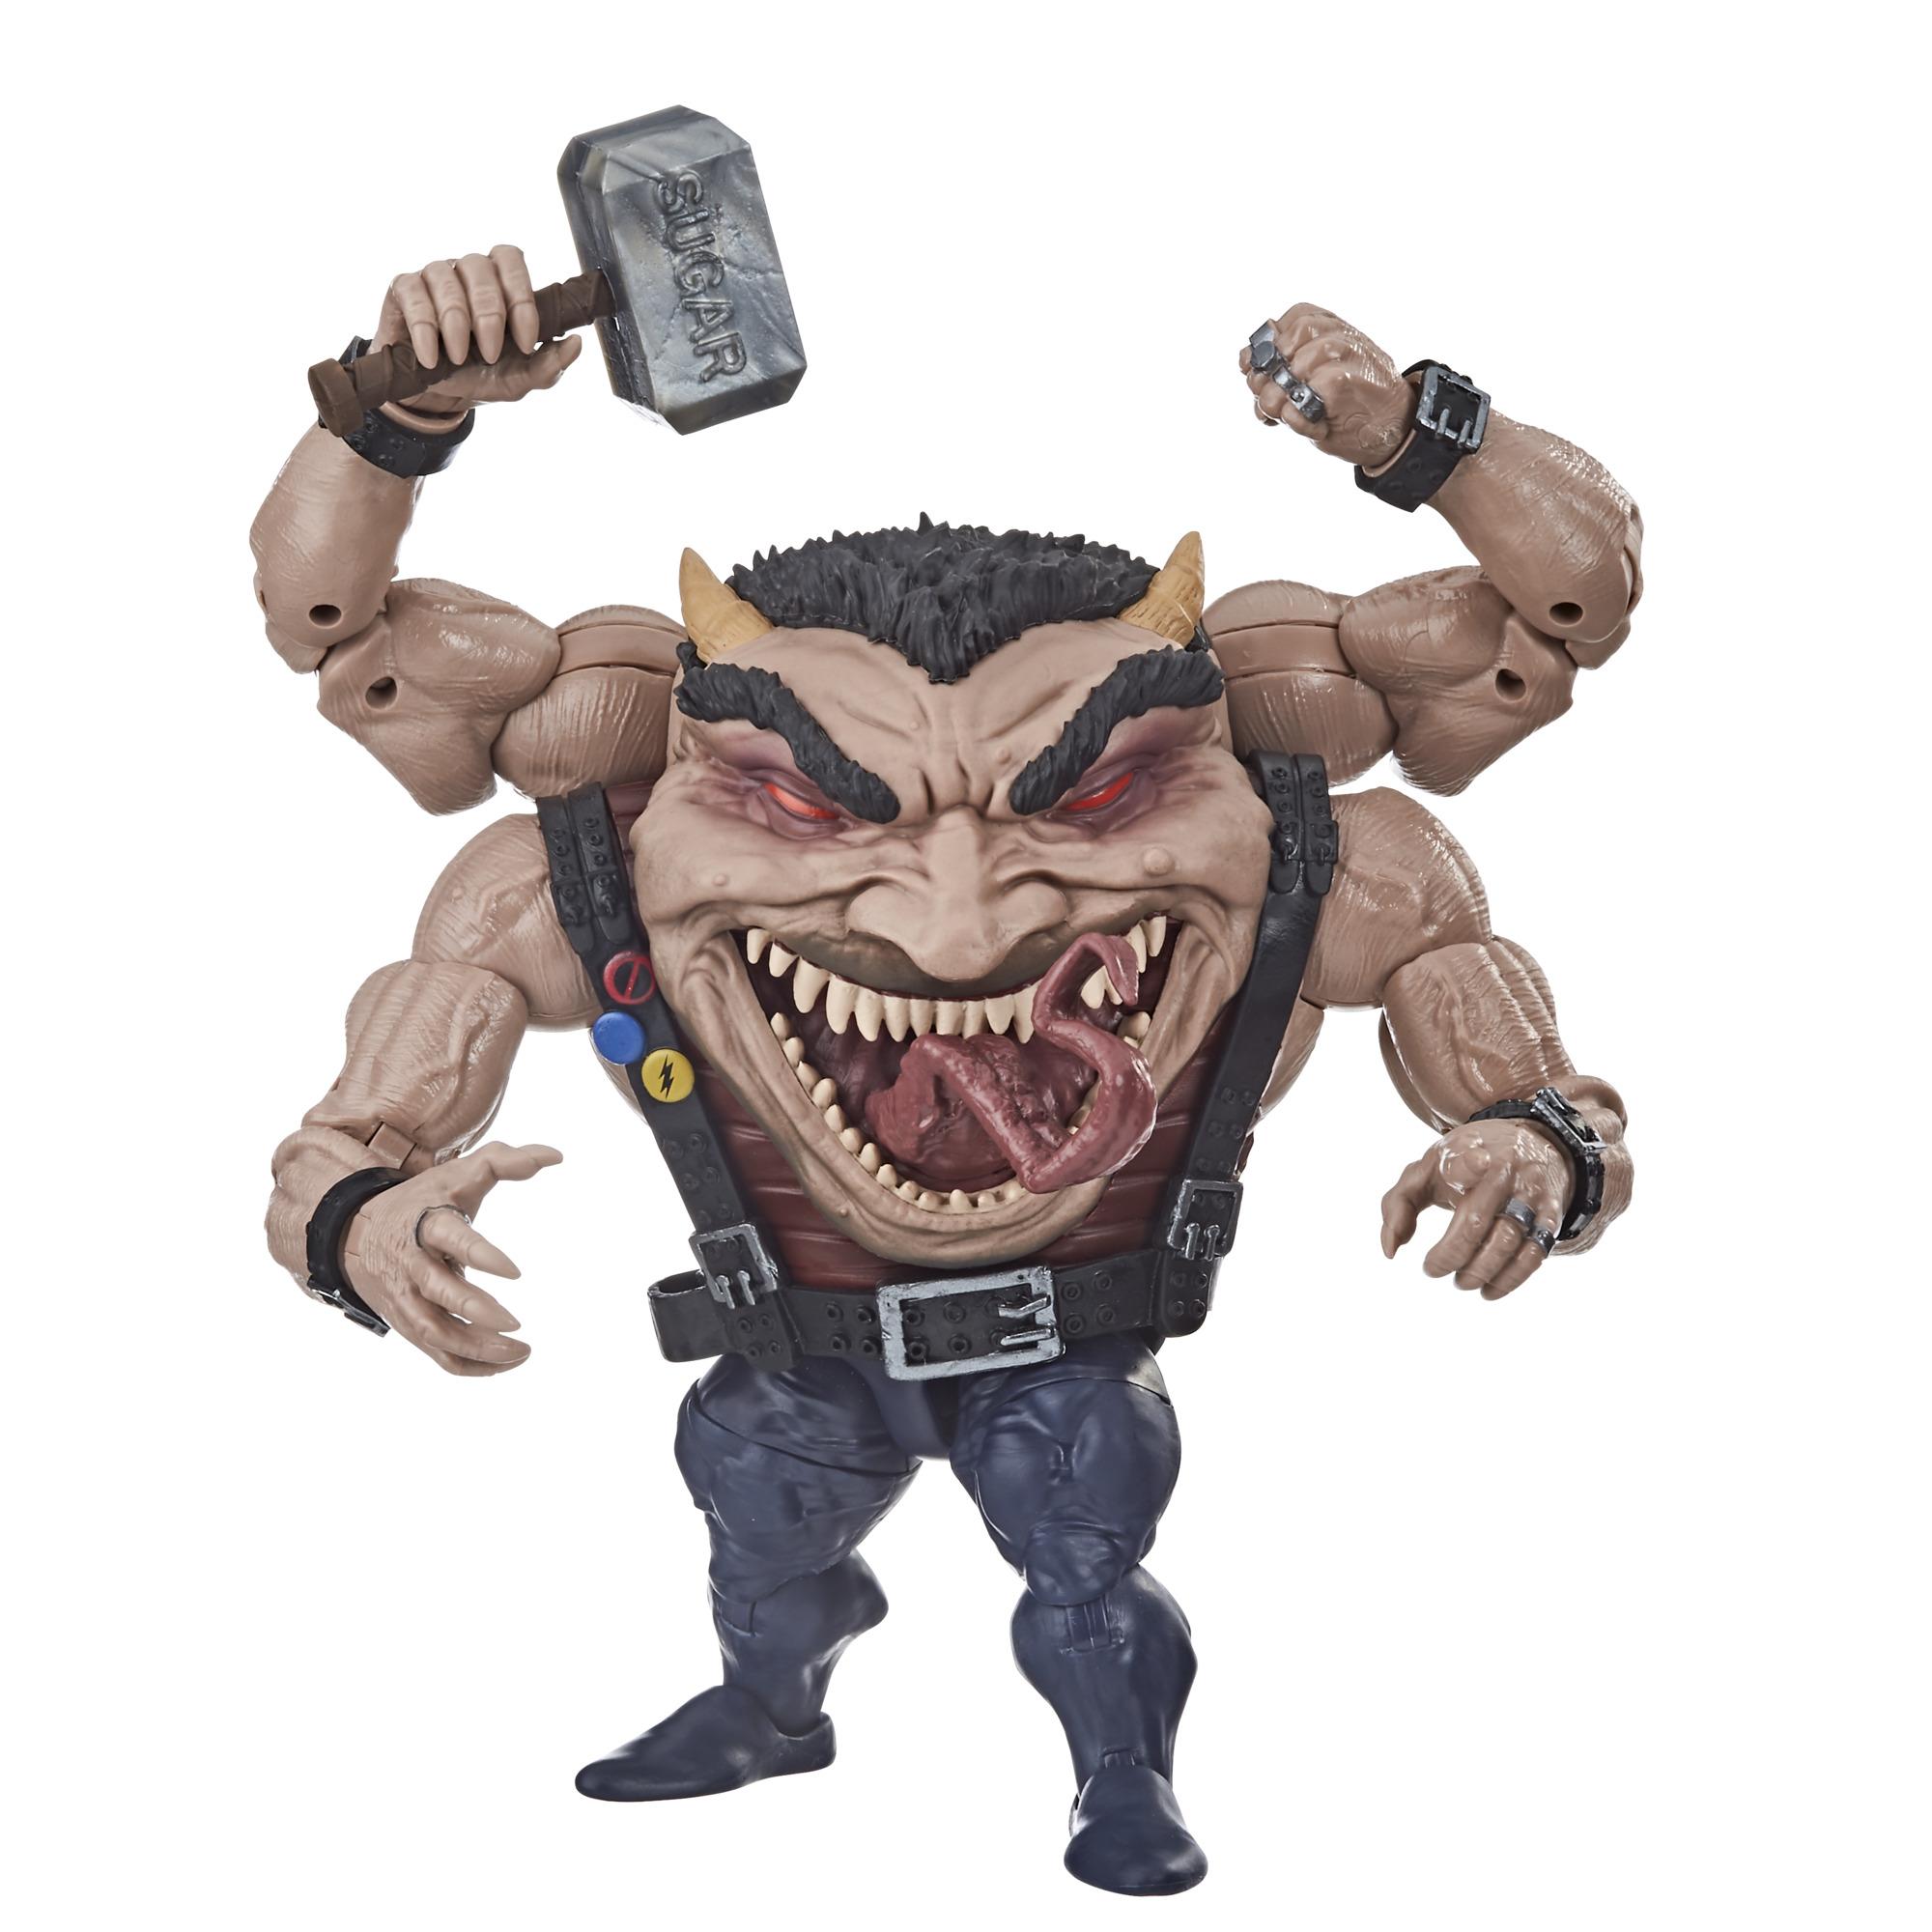 Marvel Legends Deadpool Figure Comic Book Anti-Hero Premium Series Hasbro Toy